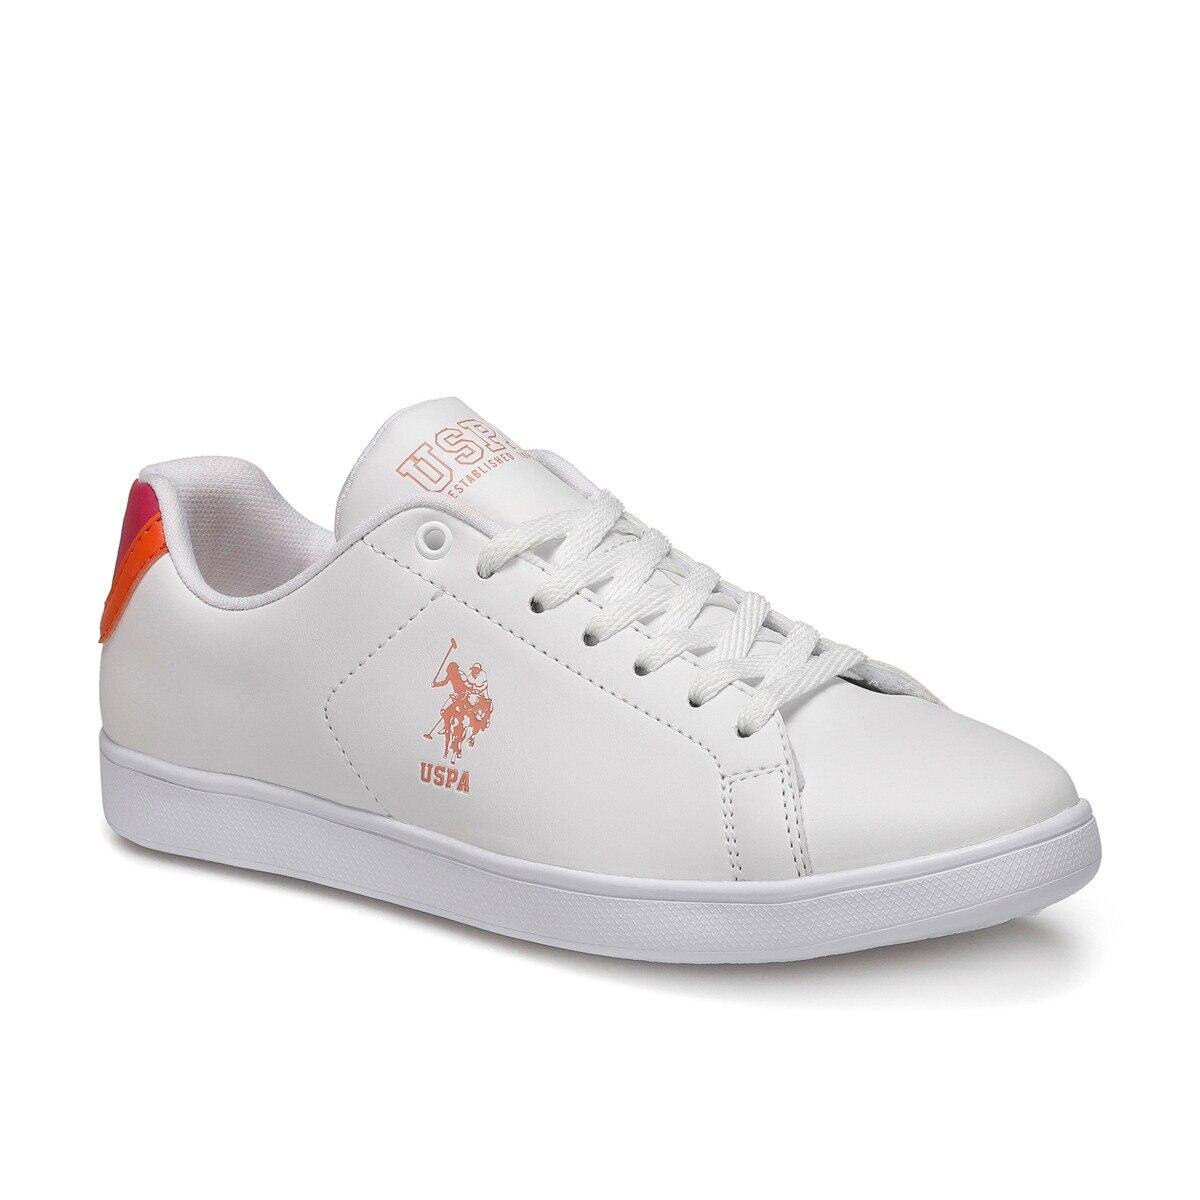 FLO TOBIAS White Women 'S Sneaker Shoes U.S. POLO ASSN.